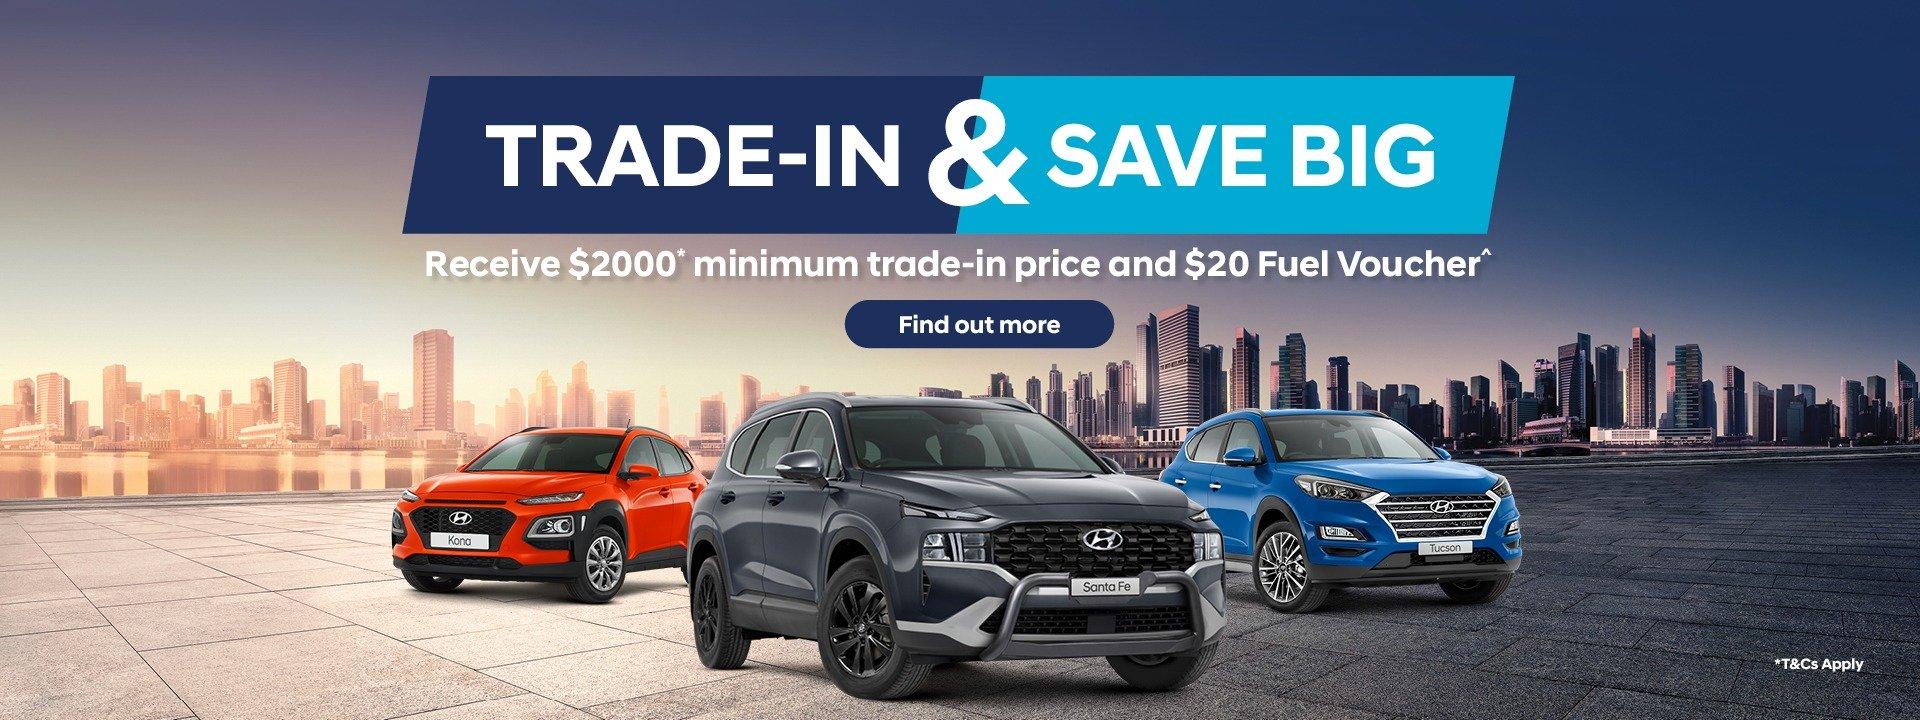 Mantello Hyundai Roxburgh Park Trade-in Offer